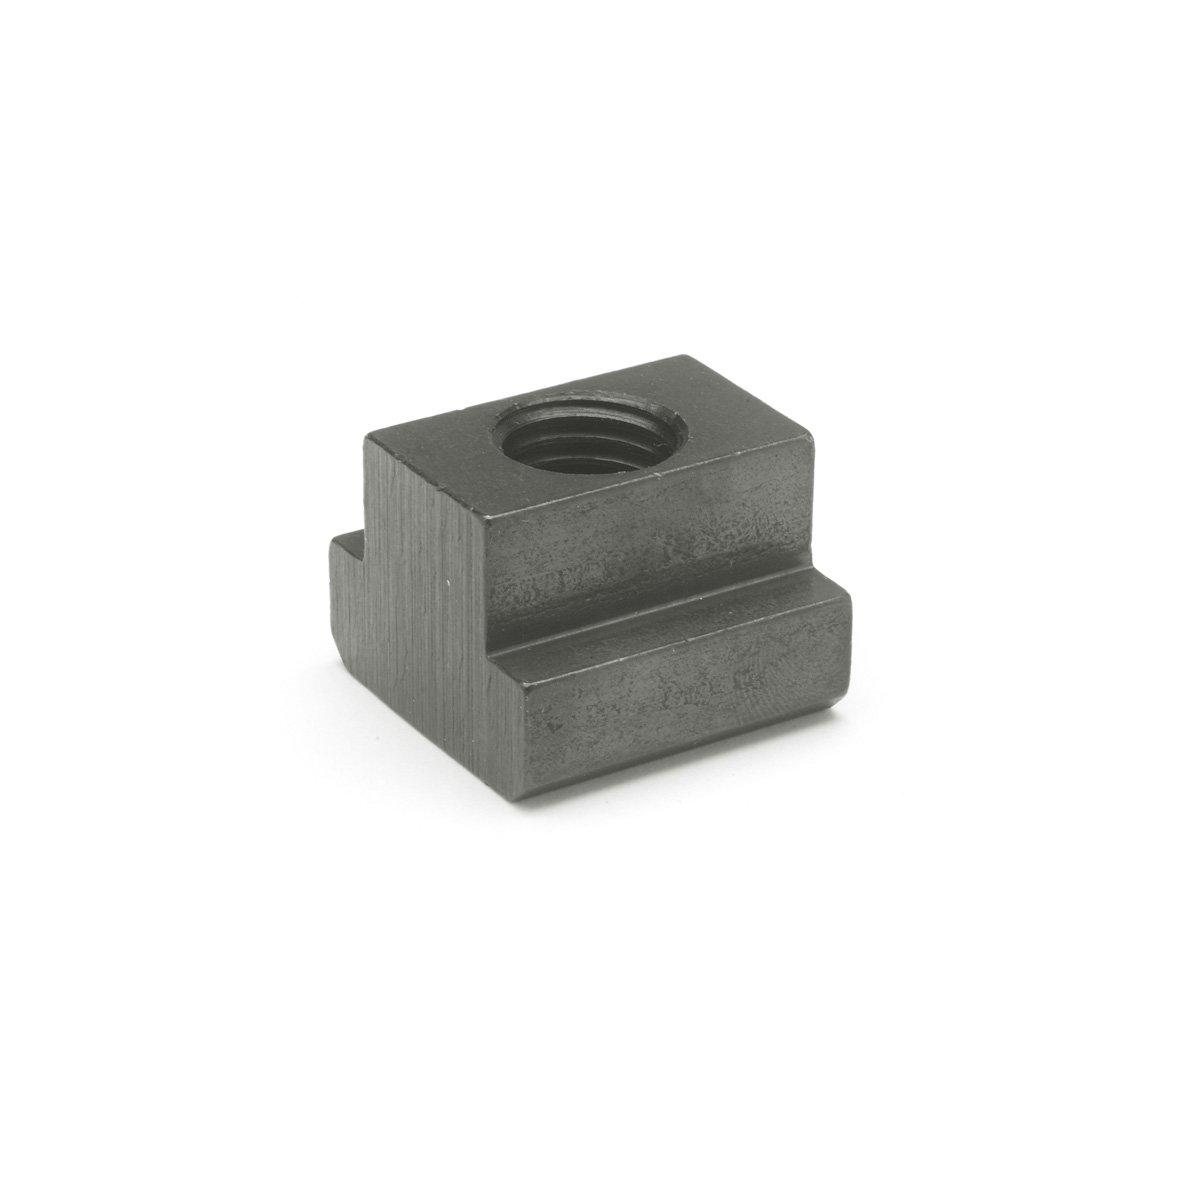 J.W. Winco A140327 DIN508 T-Slot Nut, M8 x 14 mm, Steel